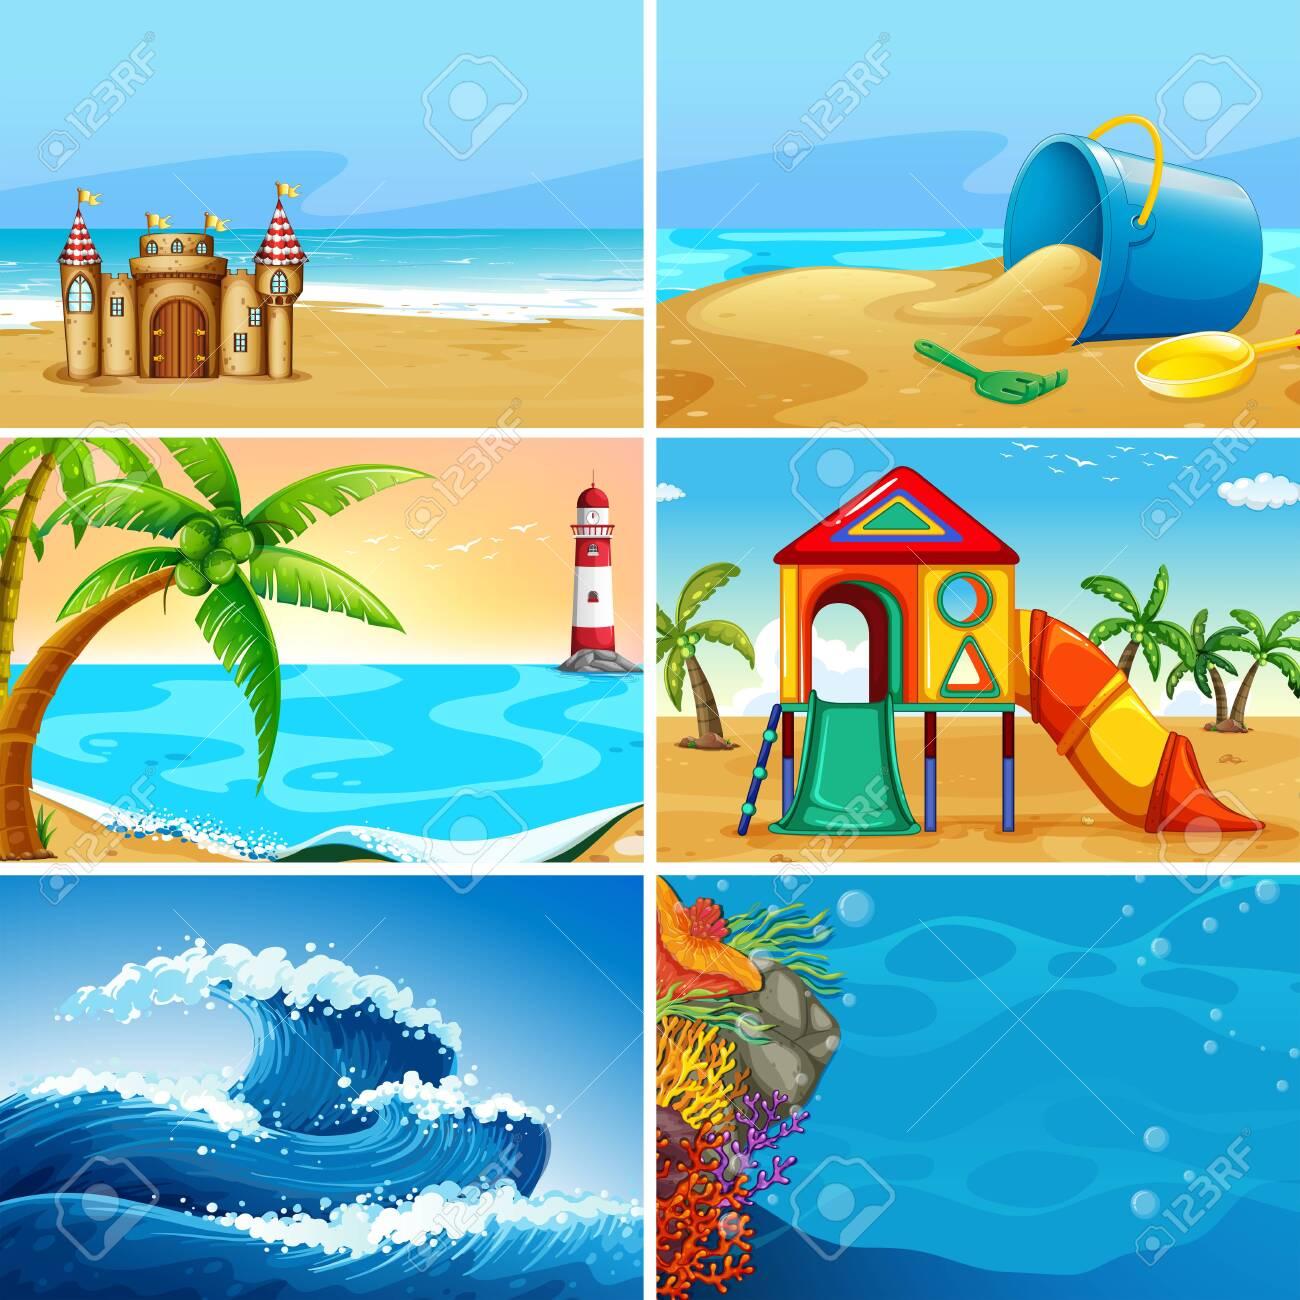 Set of summer beach landscape illustration - 122512096